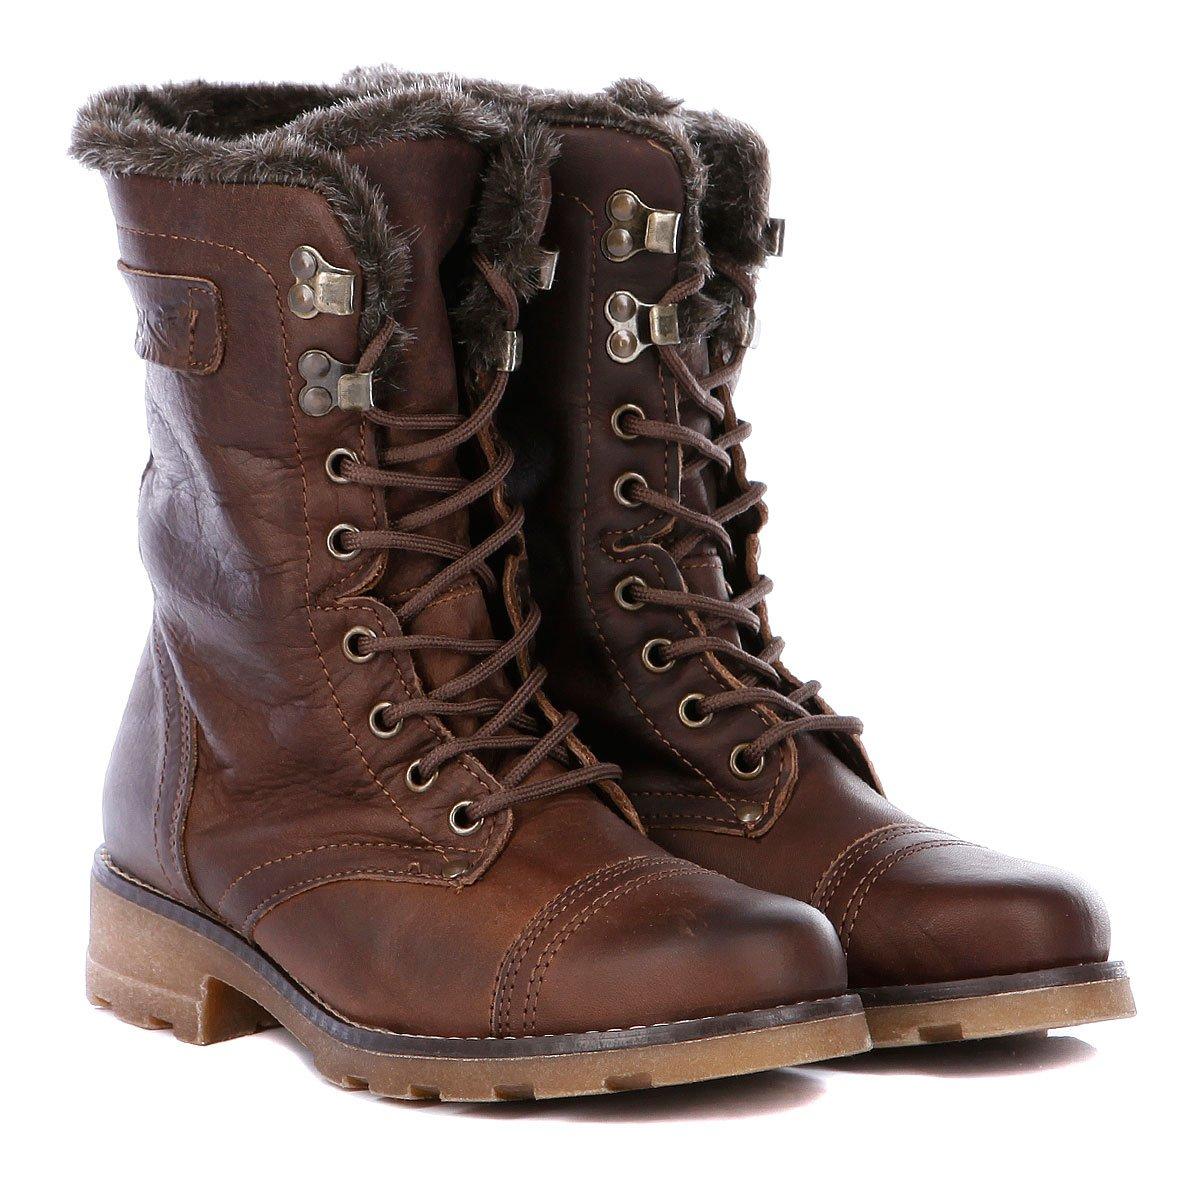 1a1756002c8a Купить ботинки женские Roxy Jin Ii Chocolat (WTWSL313) в интернет ...